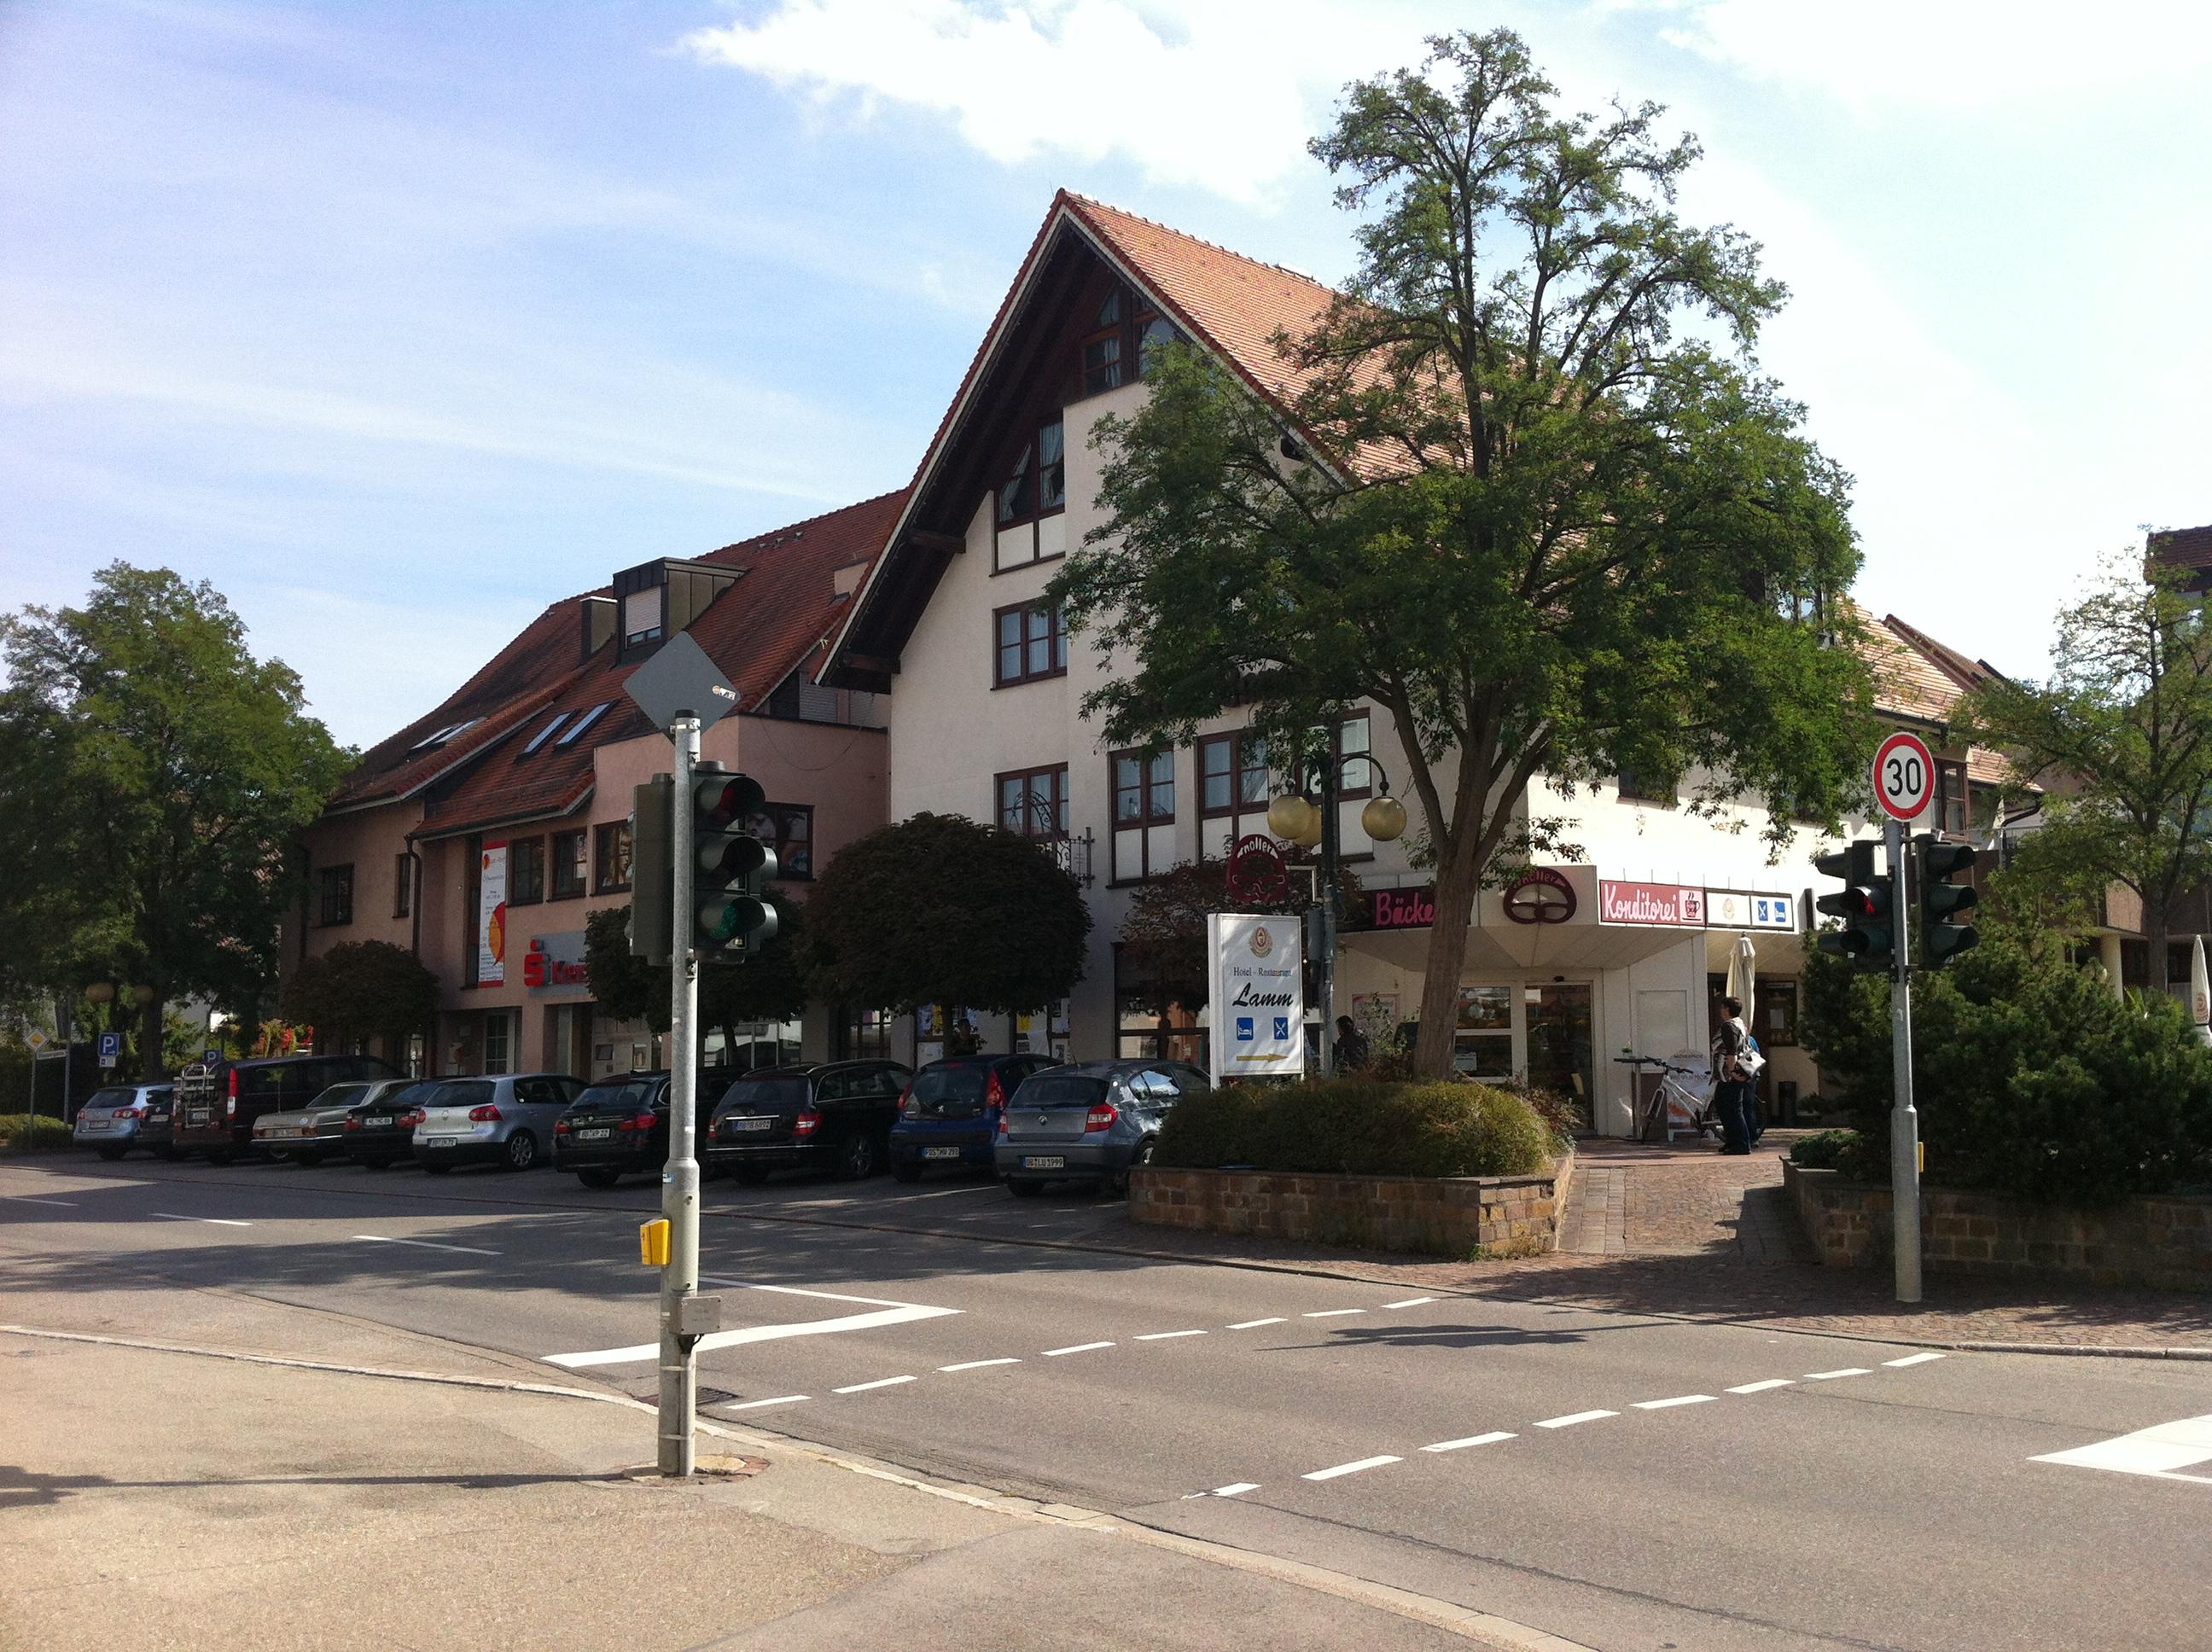 WEG Hauptstr. 30-34 / Kirchgasse 1, 5-9, Nufringen